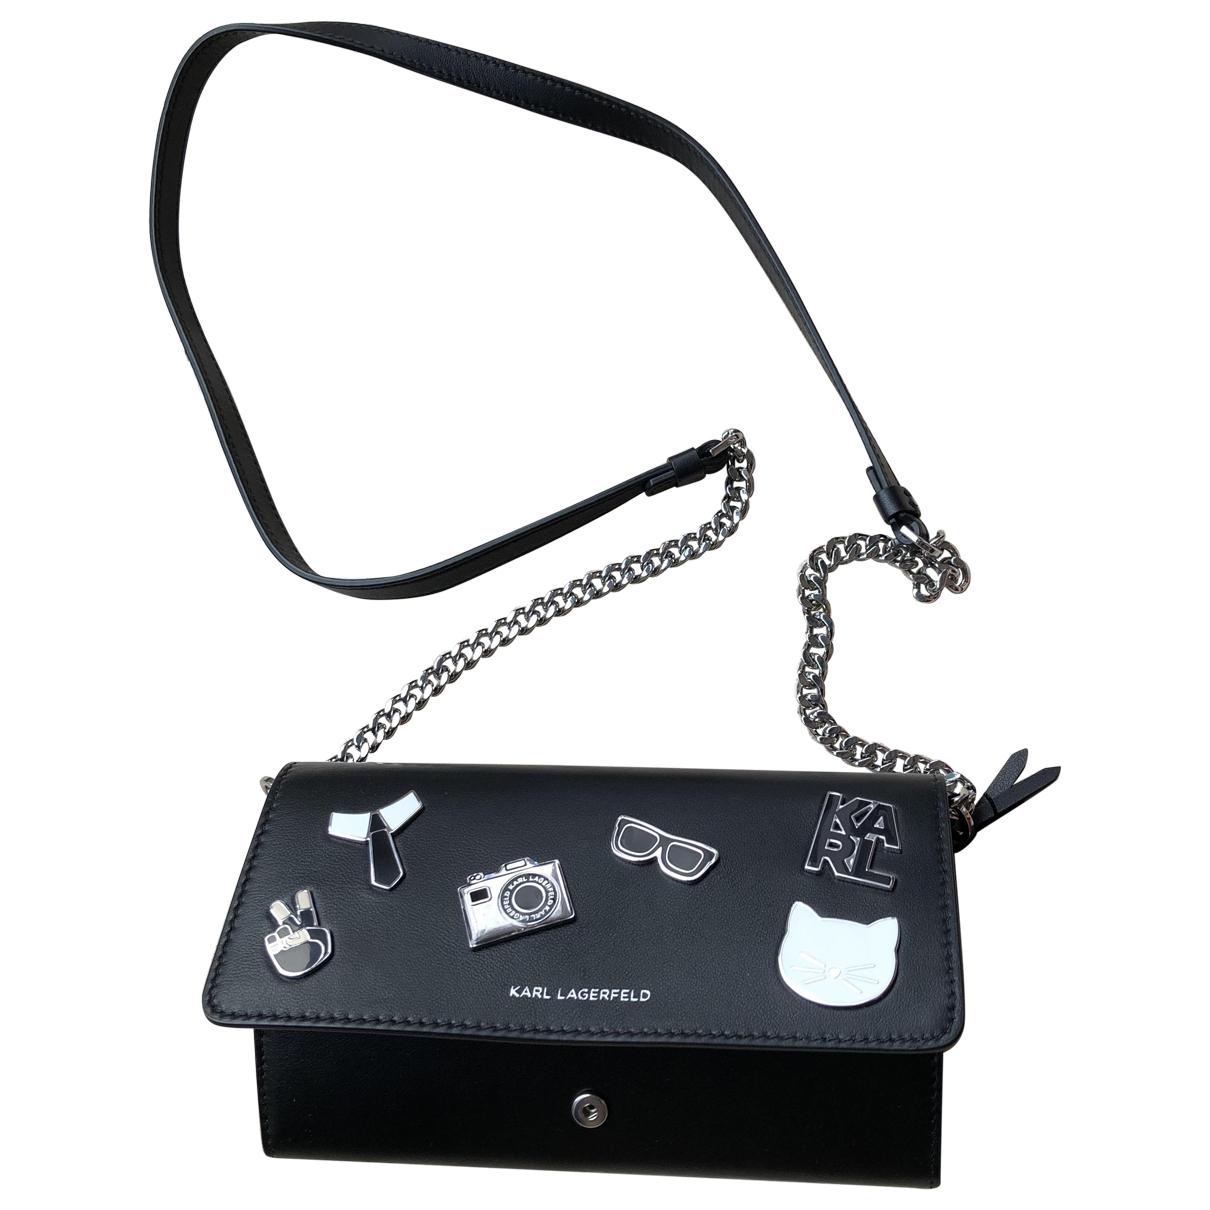 Karl Lagerfeld \N Black Leather handbag for Women \N